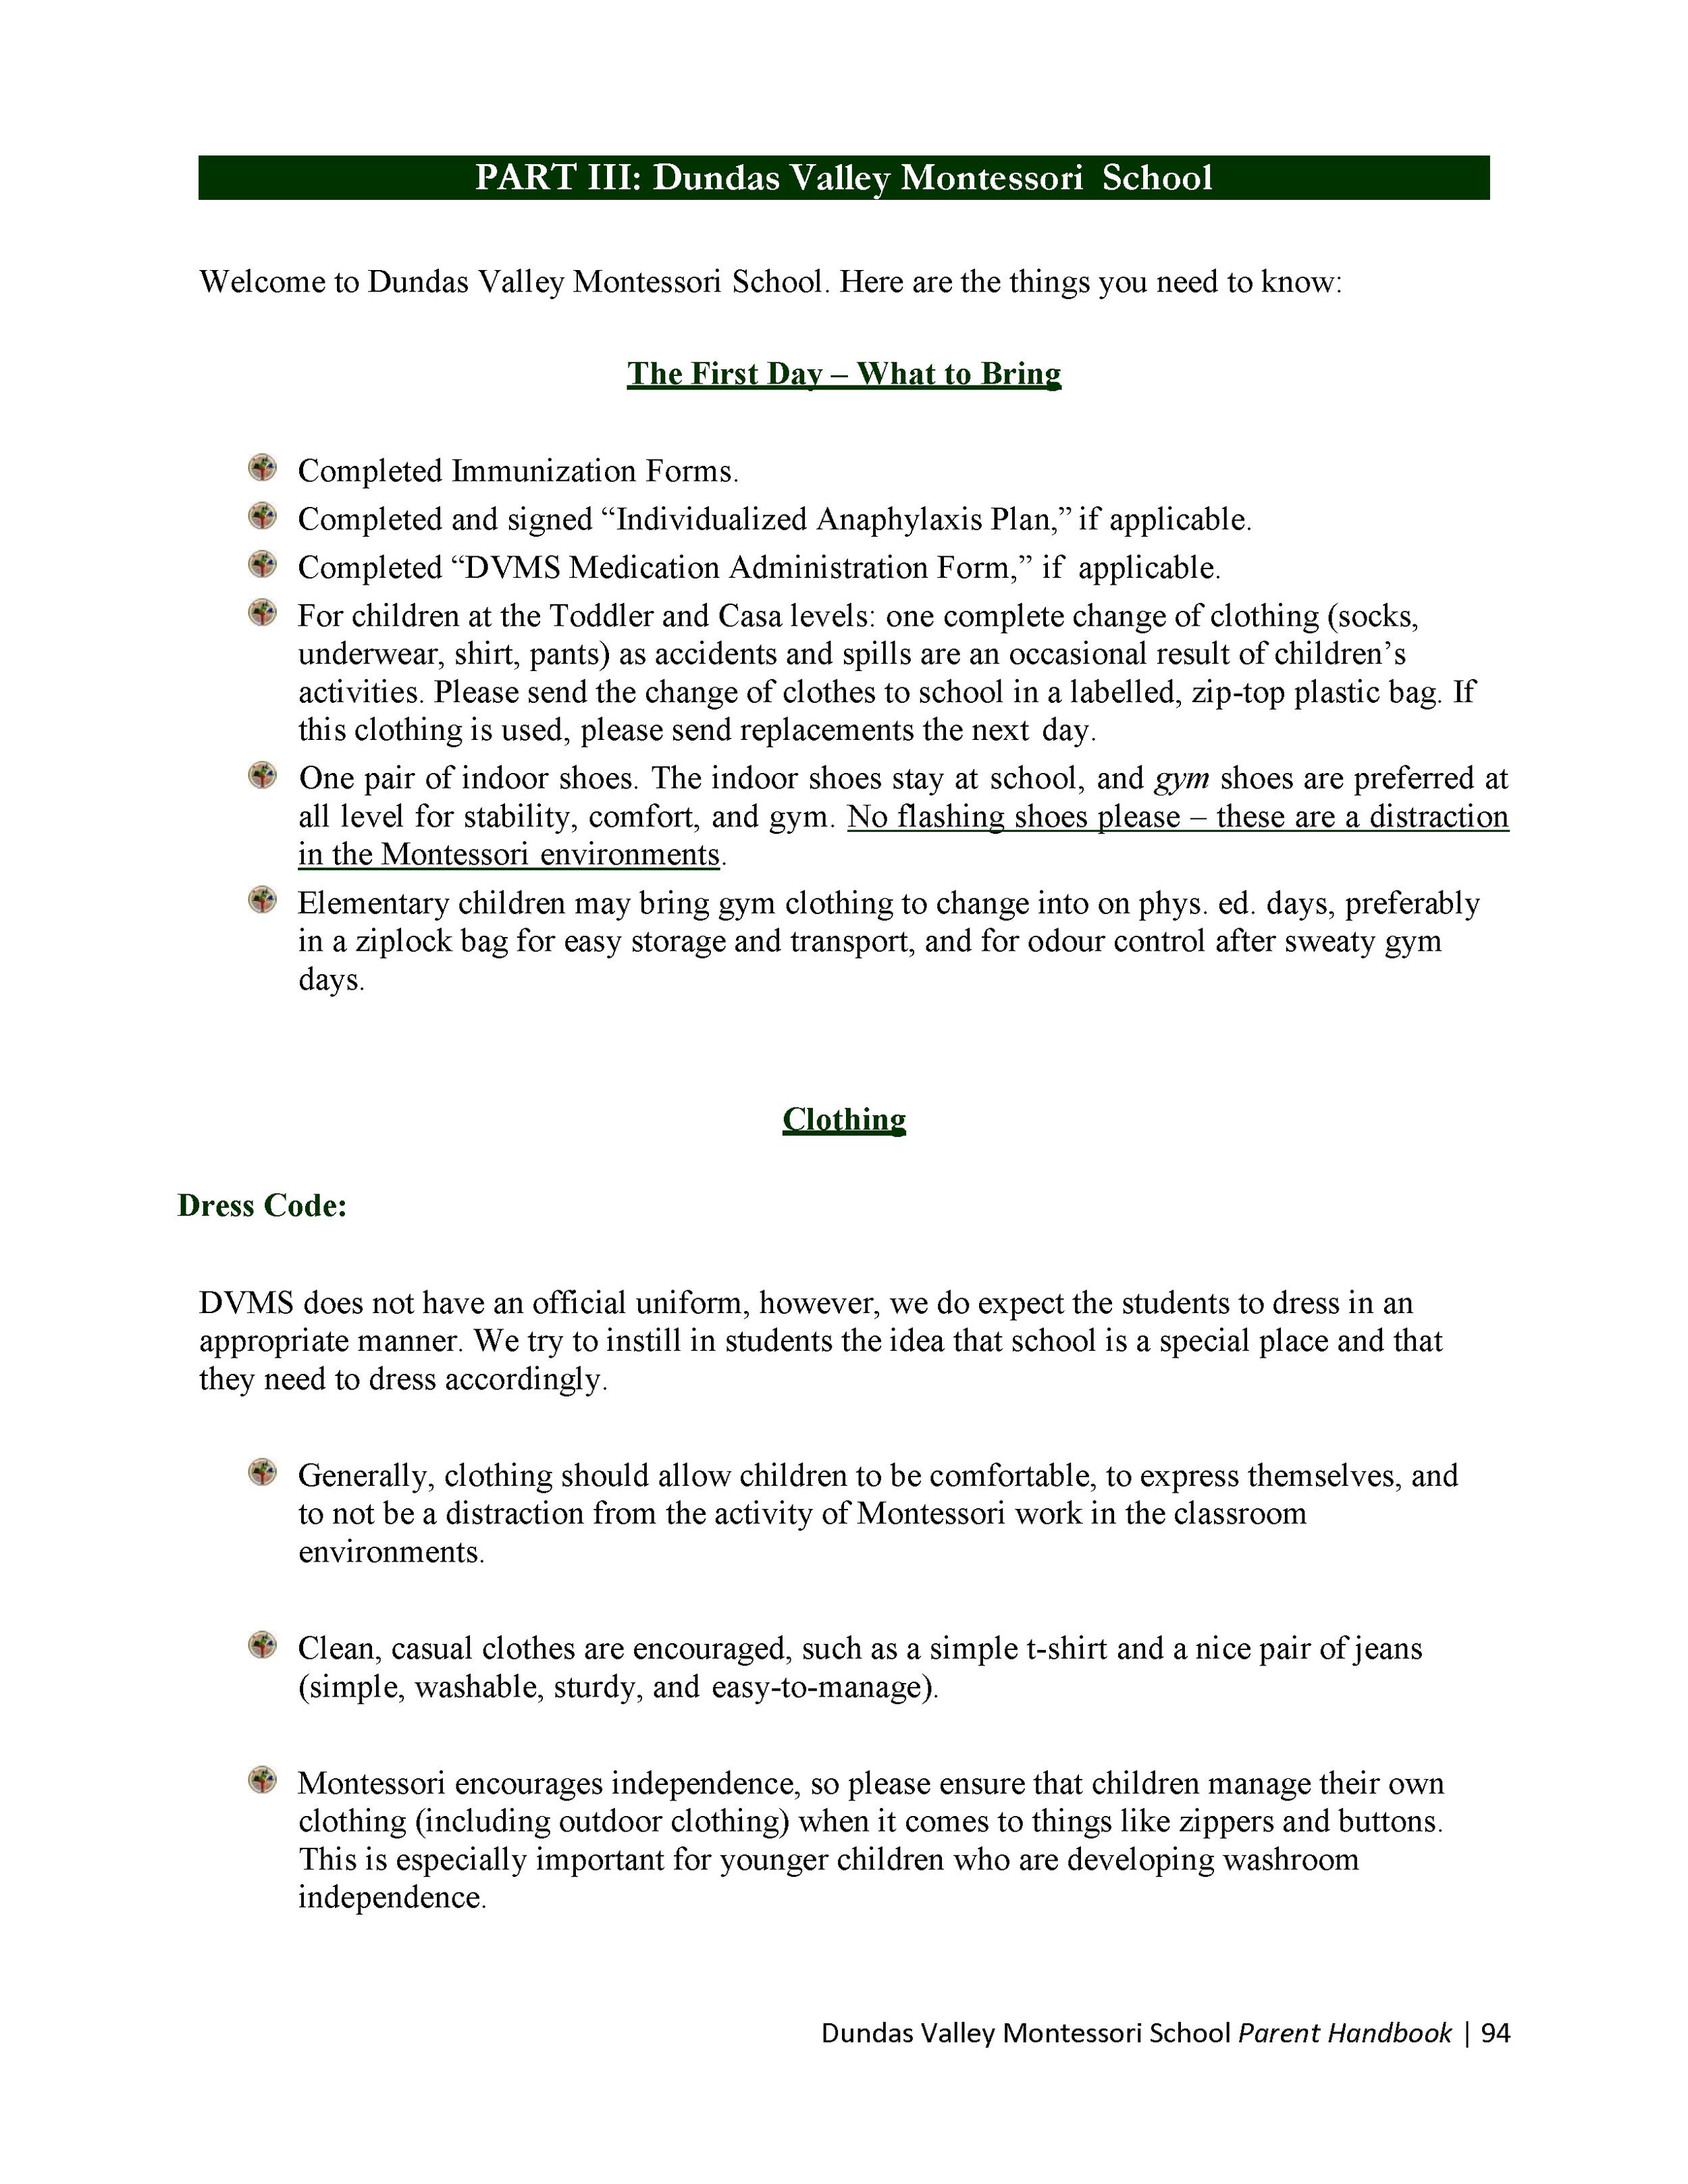 DVMS-Parent-Handbook-19-20_Page_096.png